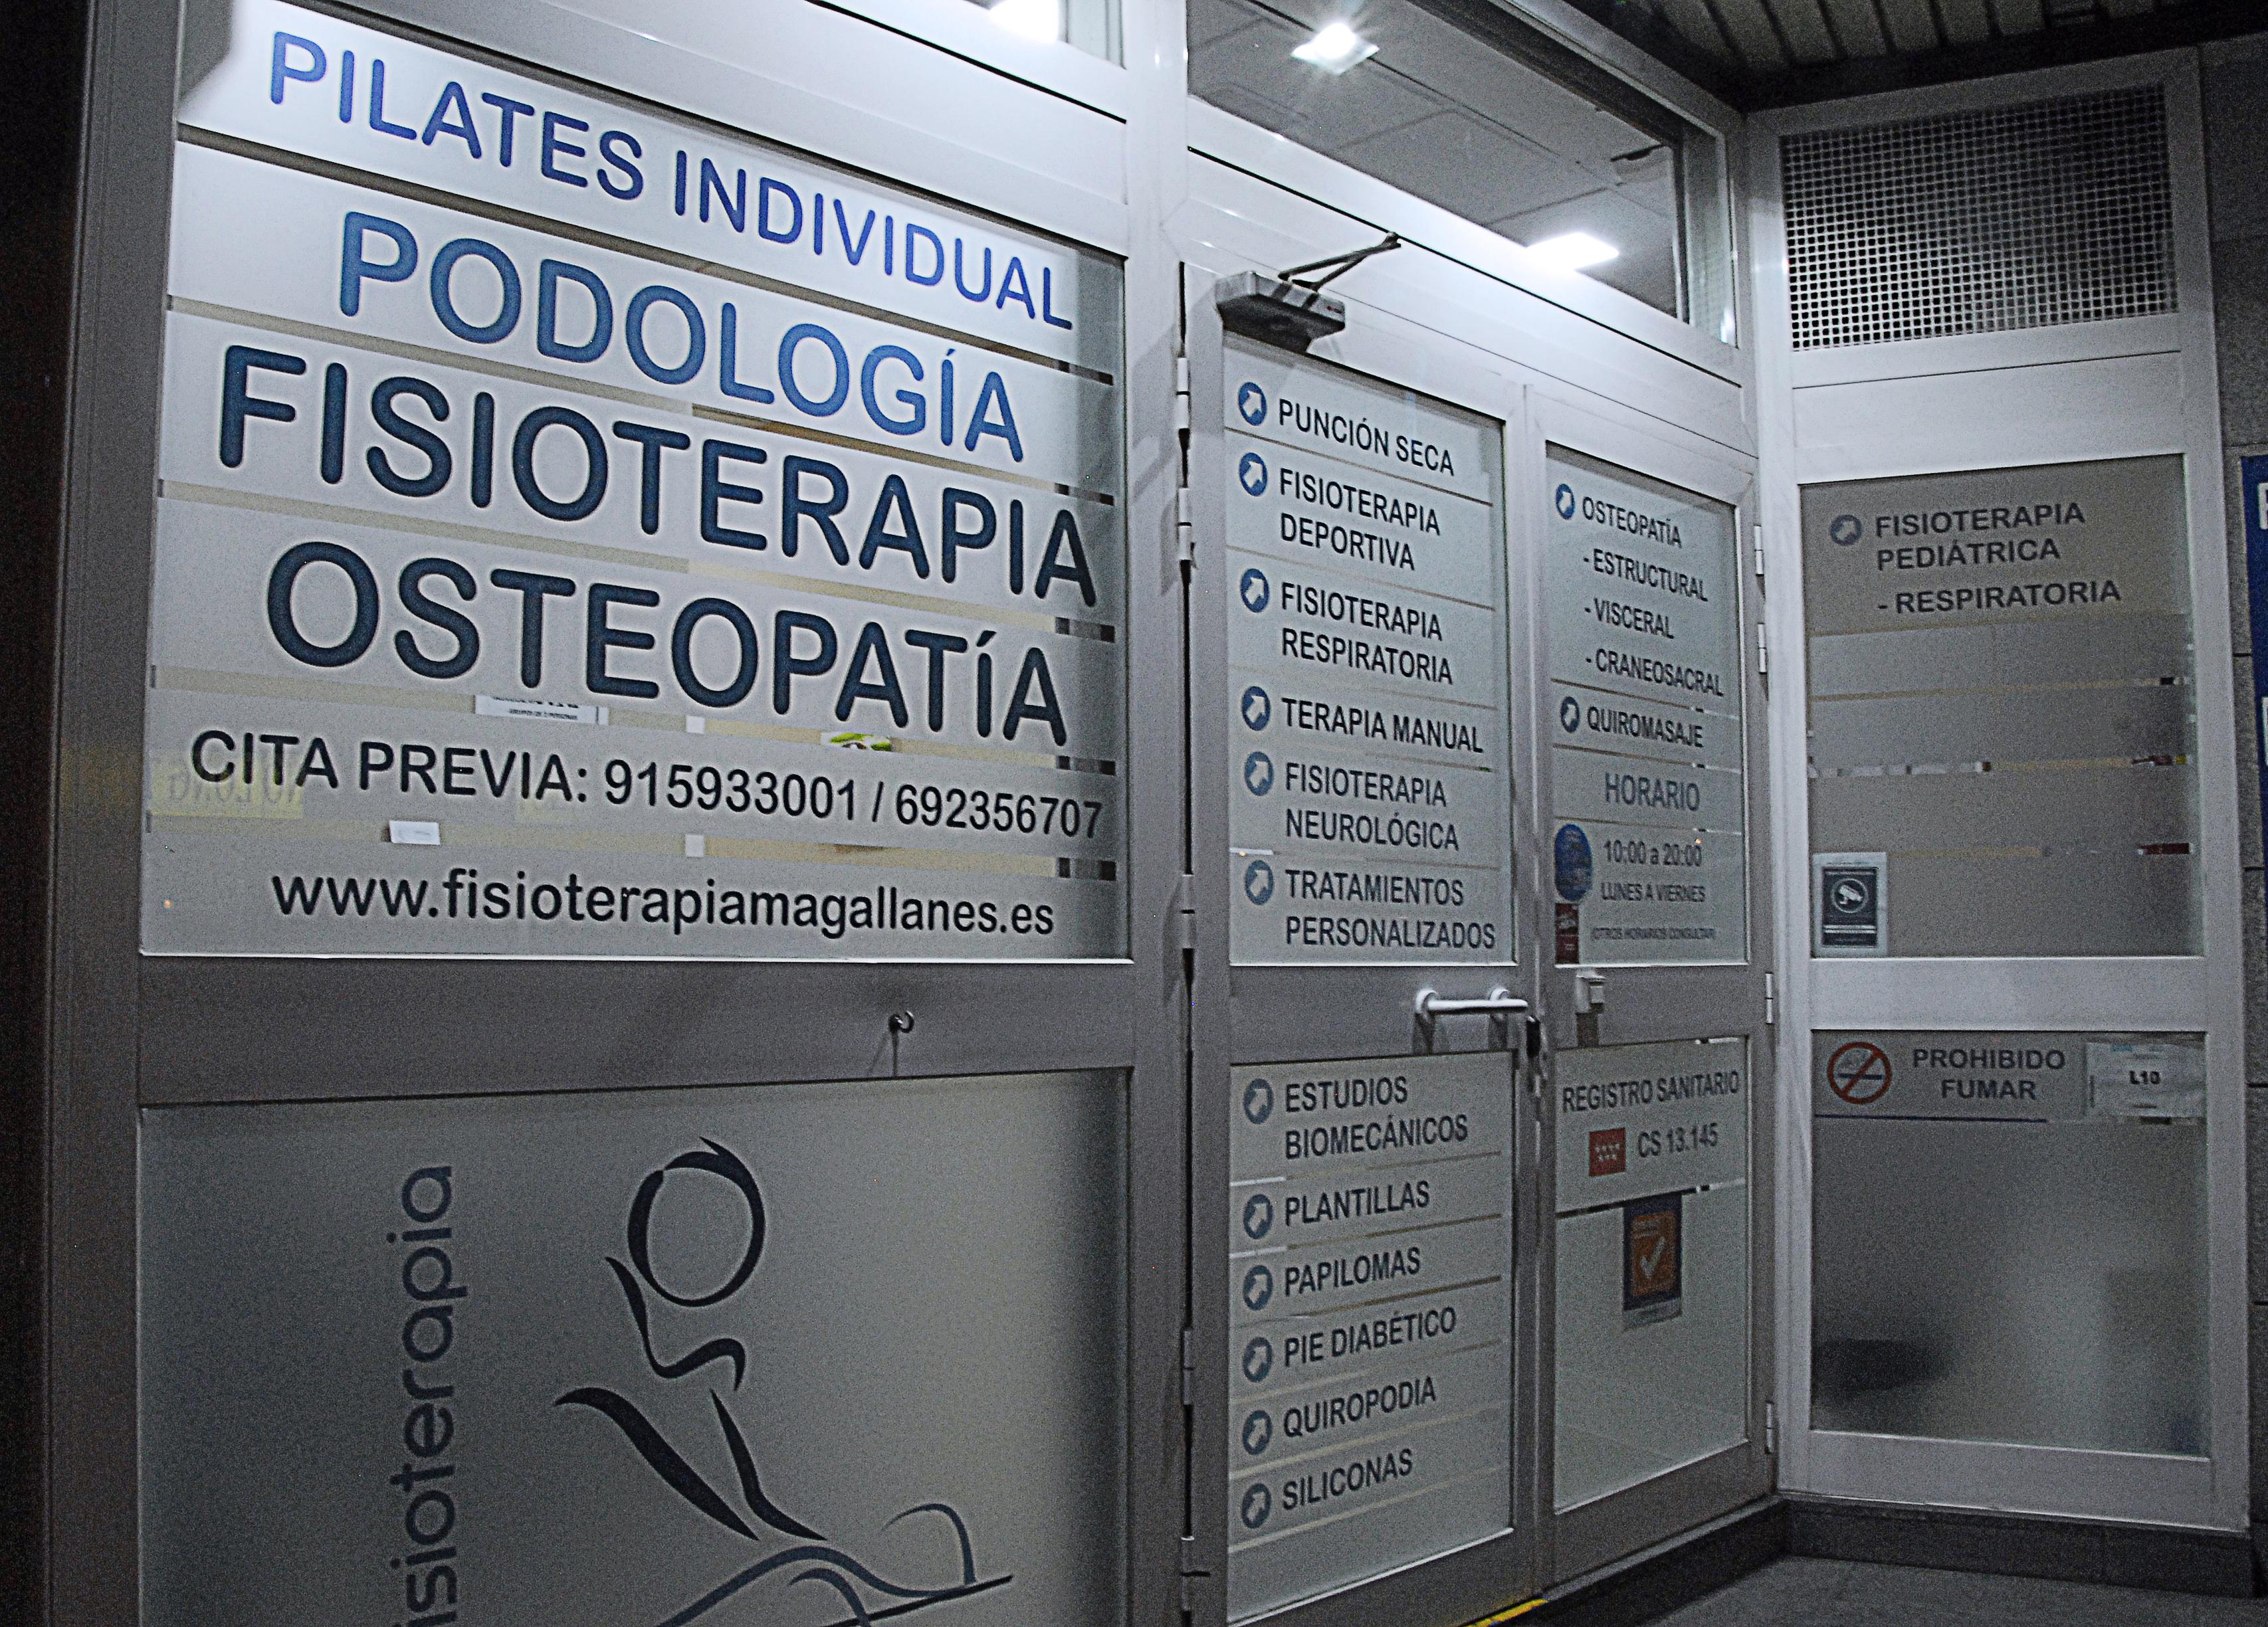 Encantador Plantillas De Documentación De Fisioterapia Molde ...